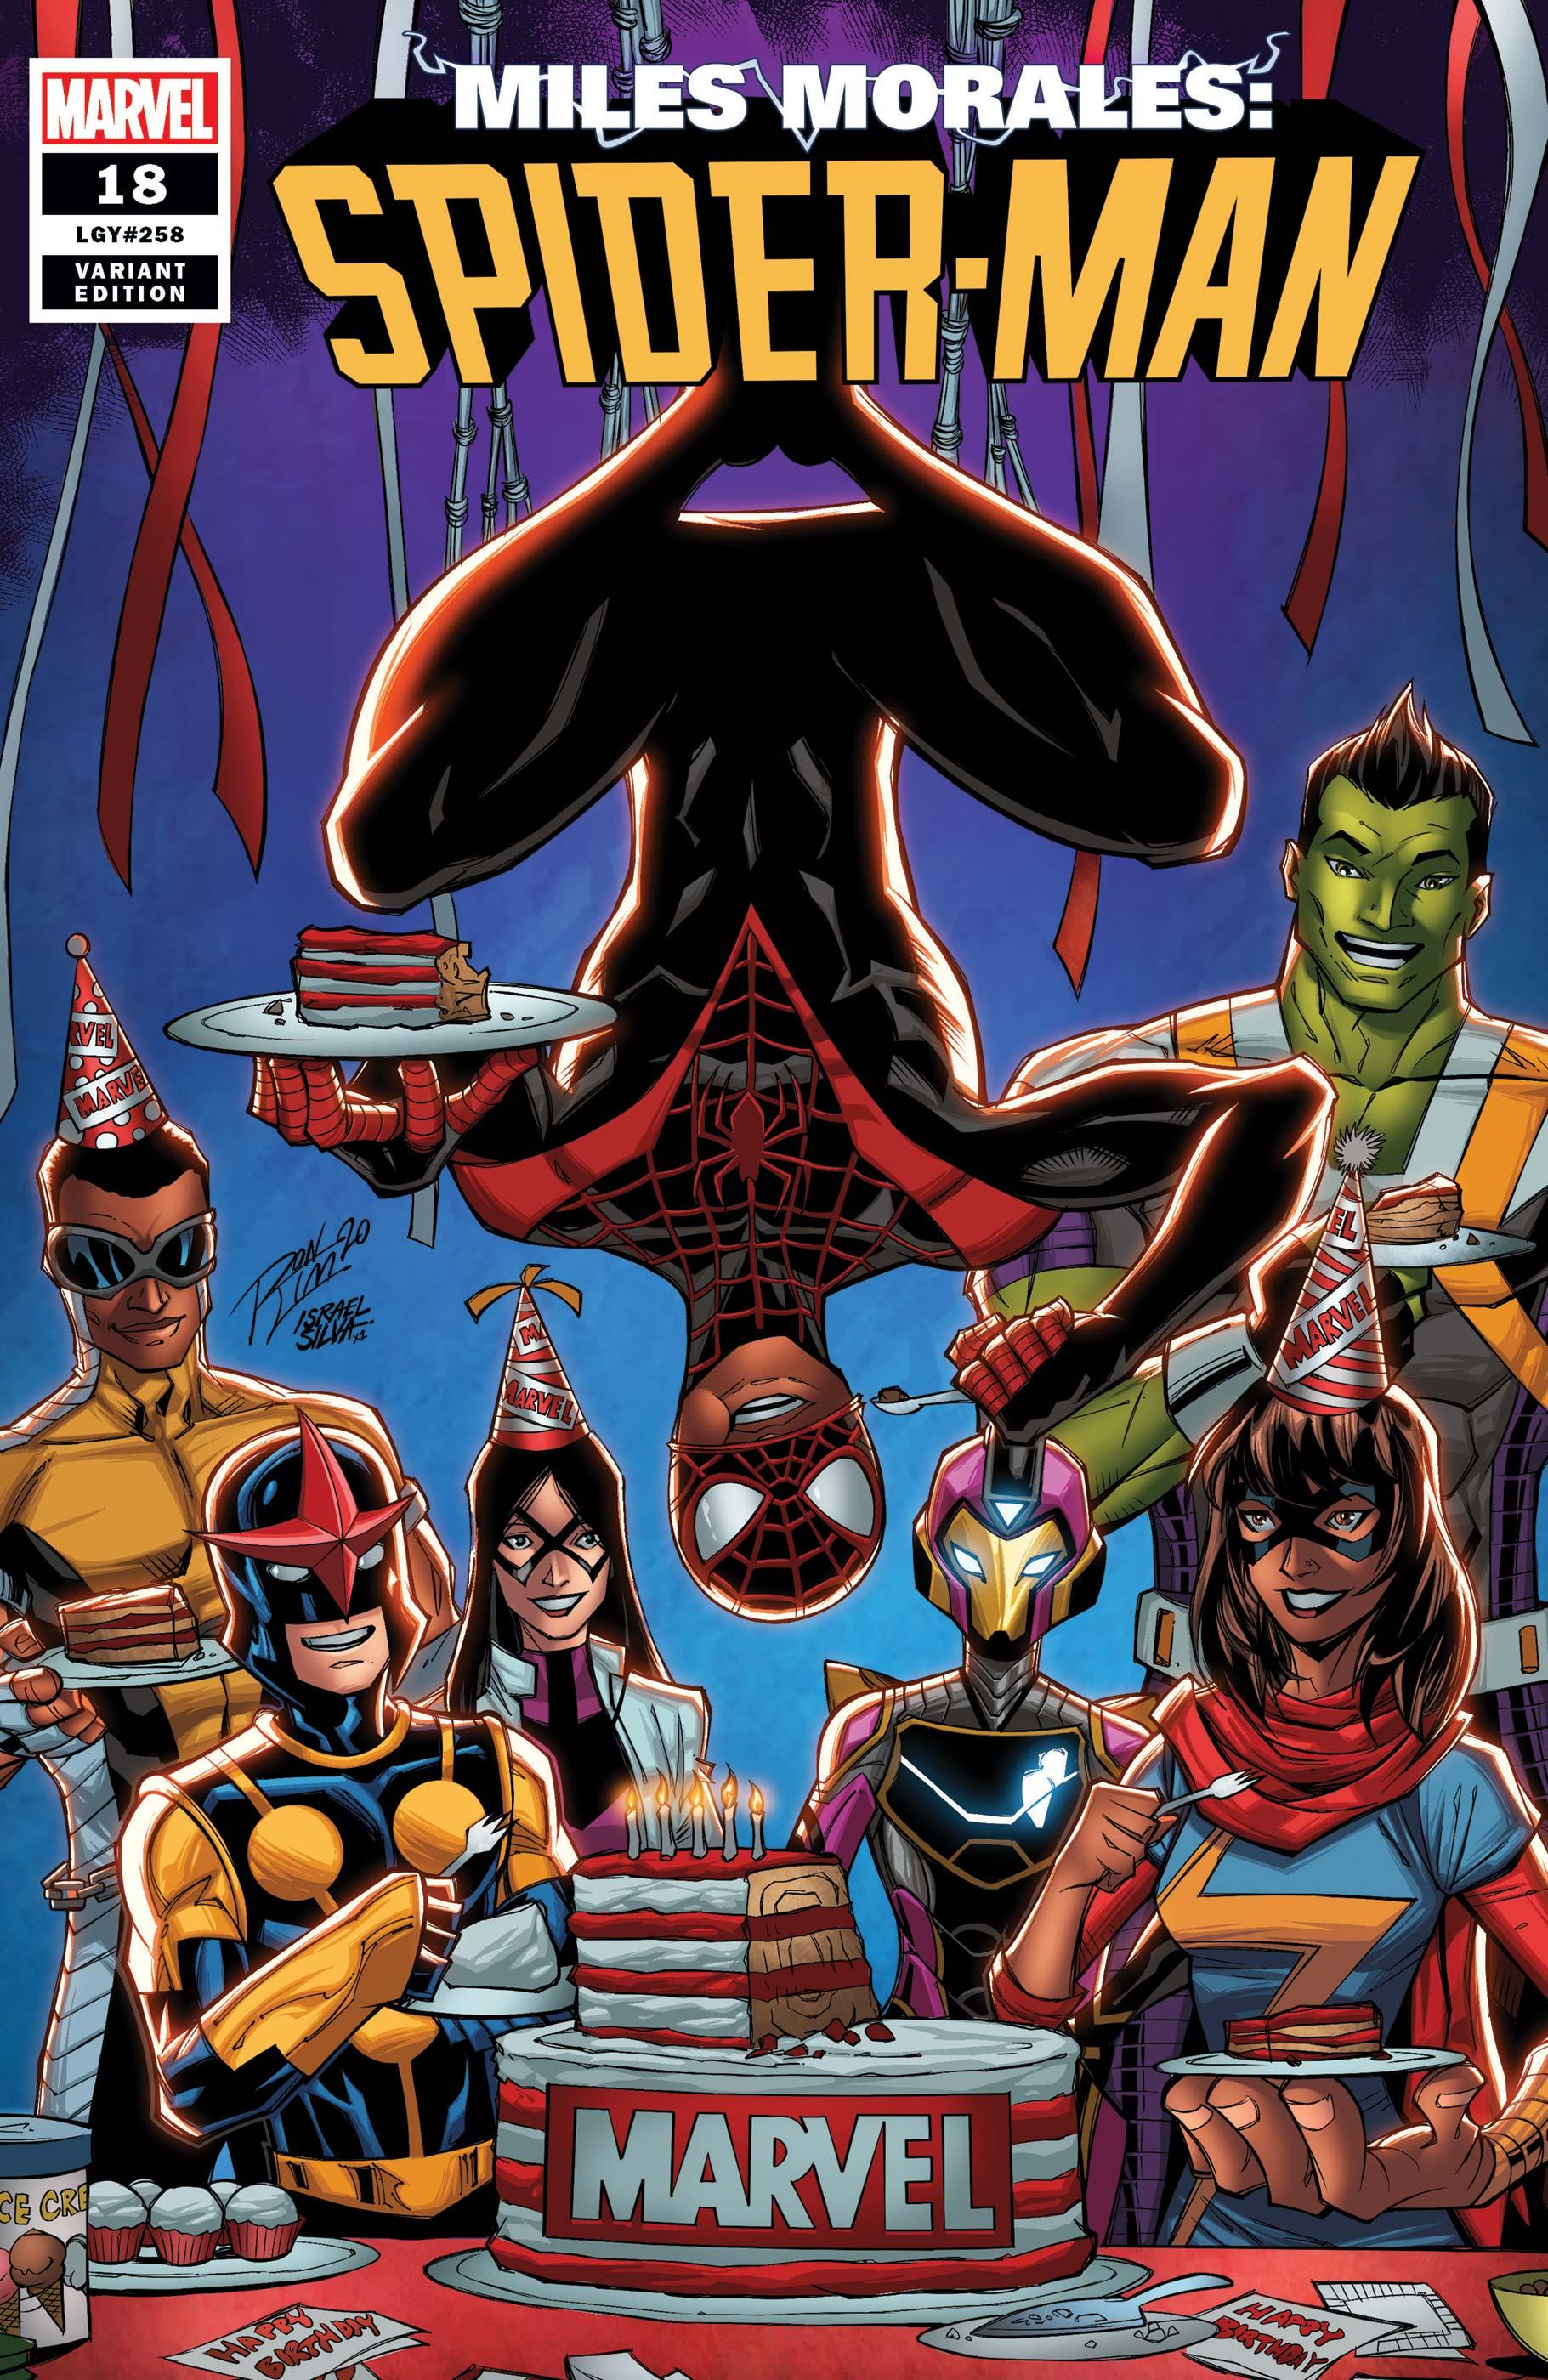 Miles Morales: Spider-Man (2018) #18 (Variant)